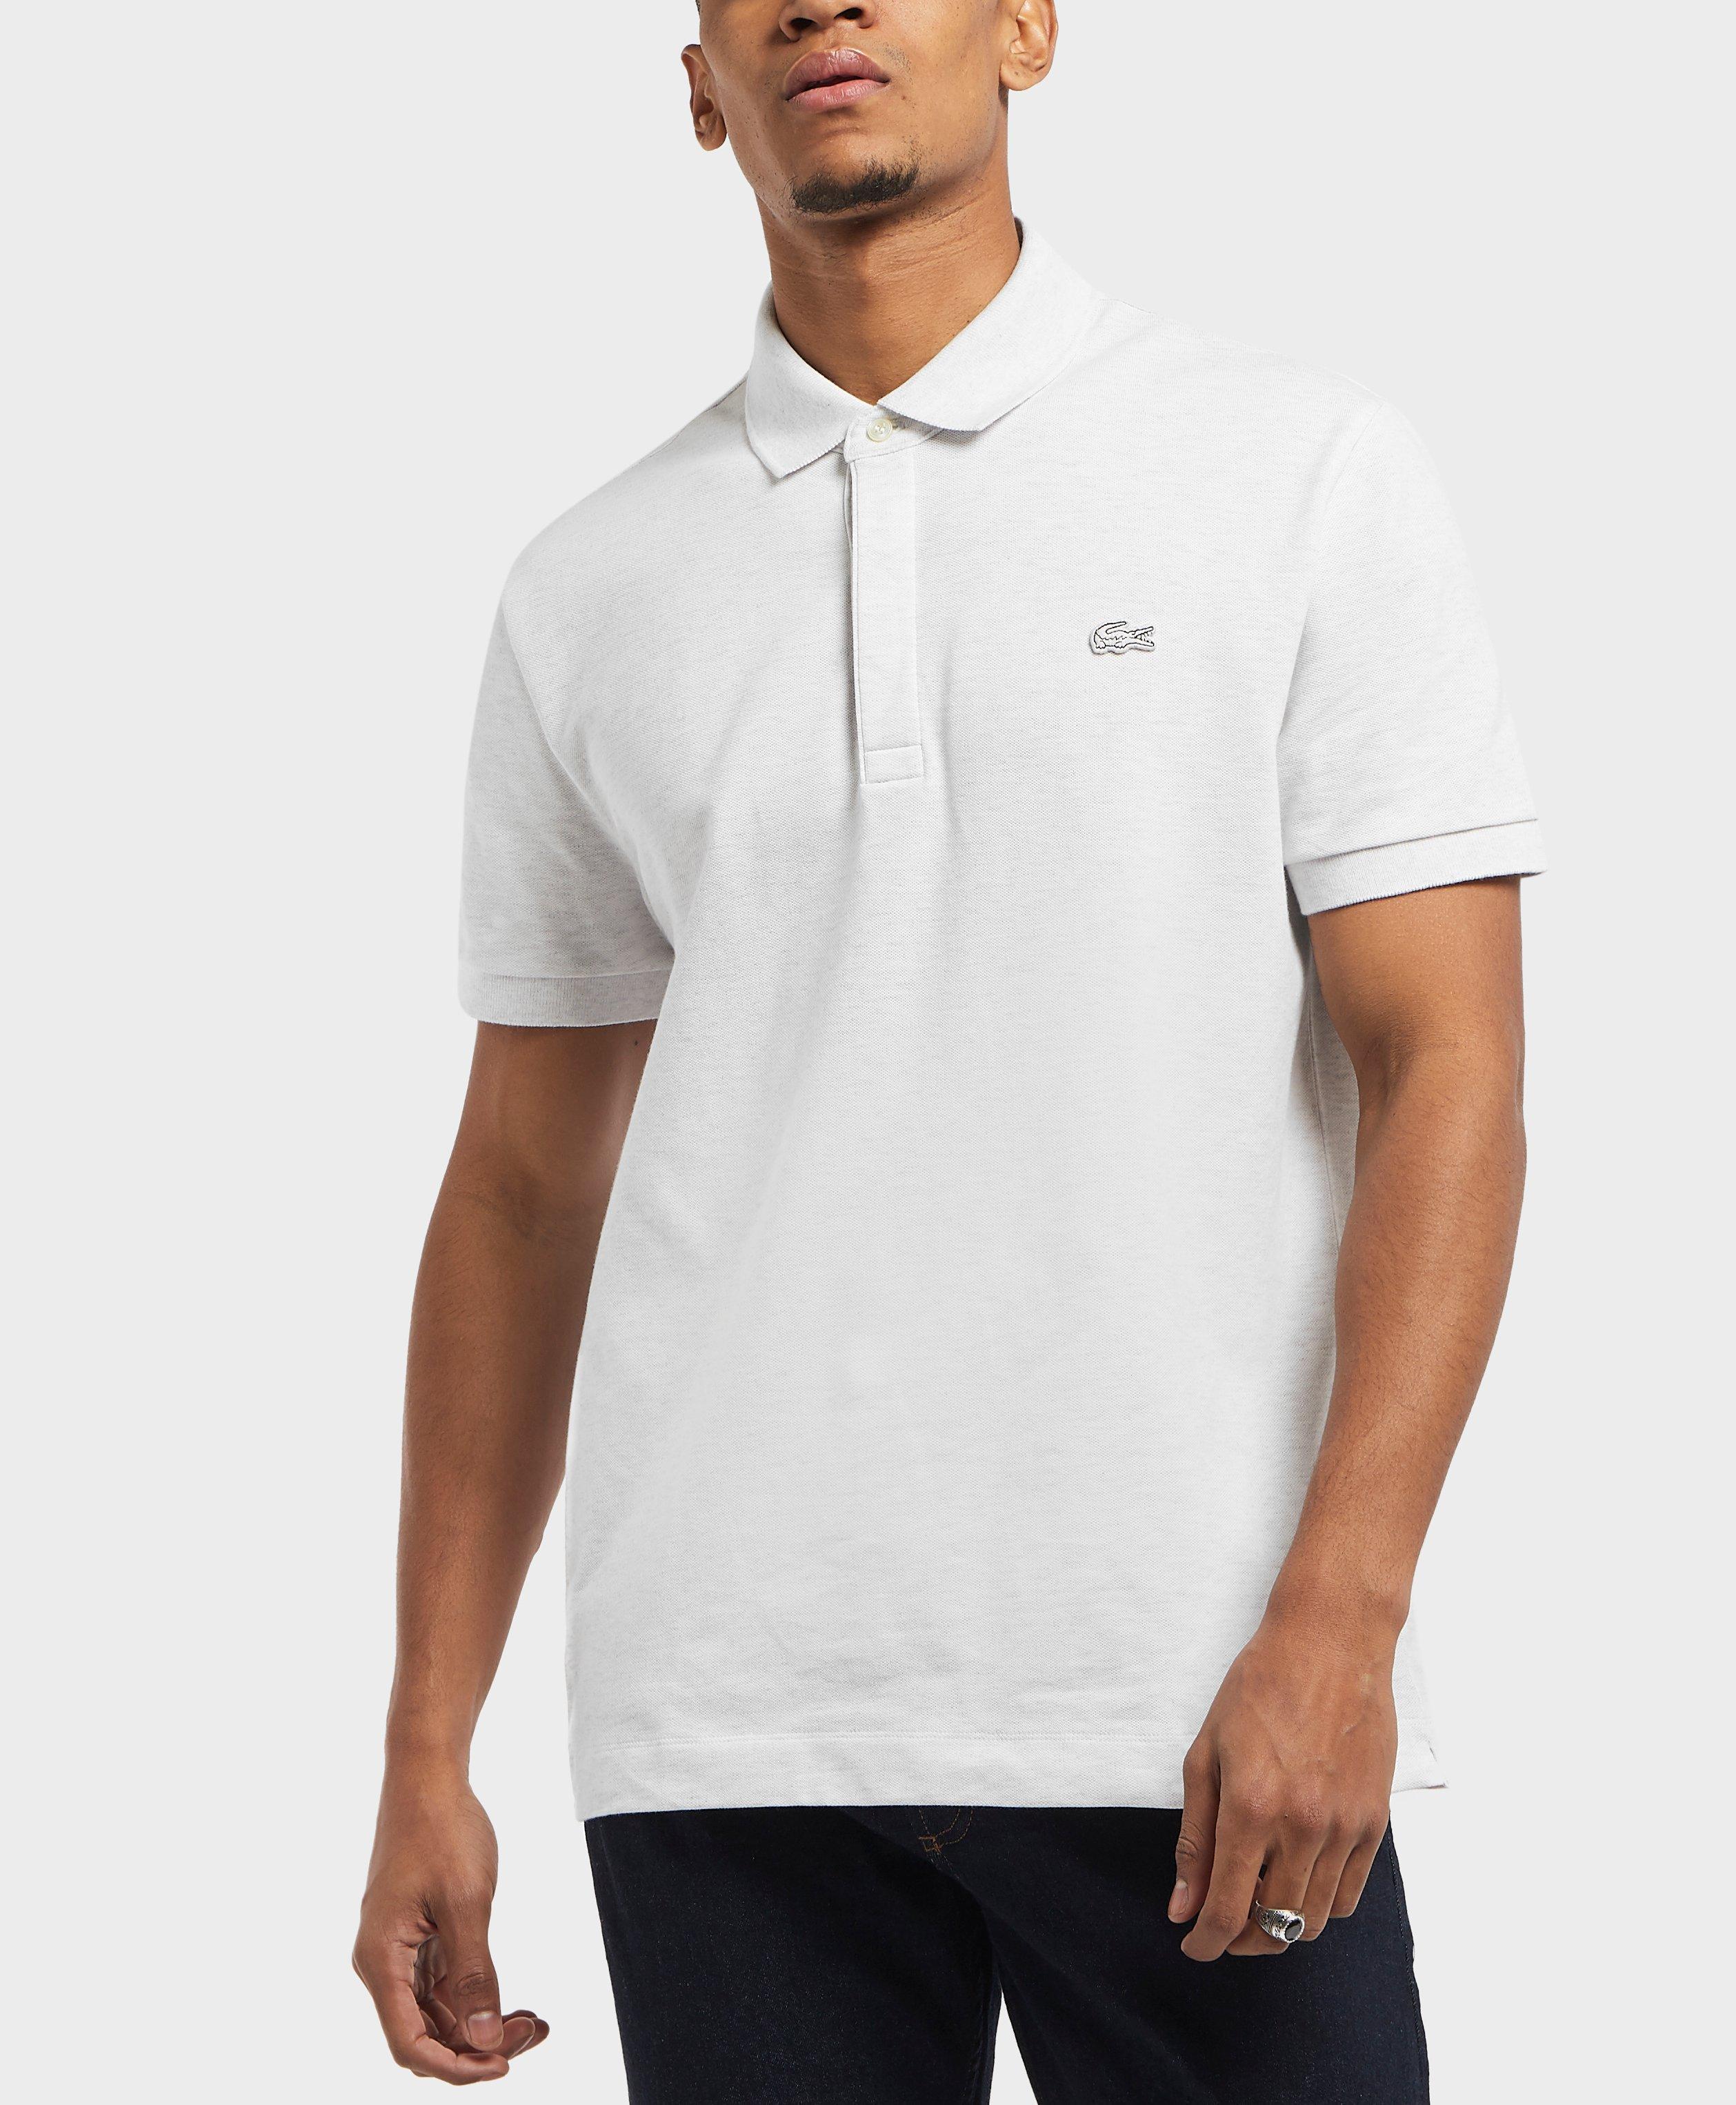 e18c0c2372 Lyst - Lacoste Short Sleeve Paris Polo Shirt in White for Men